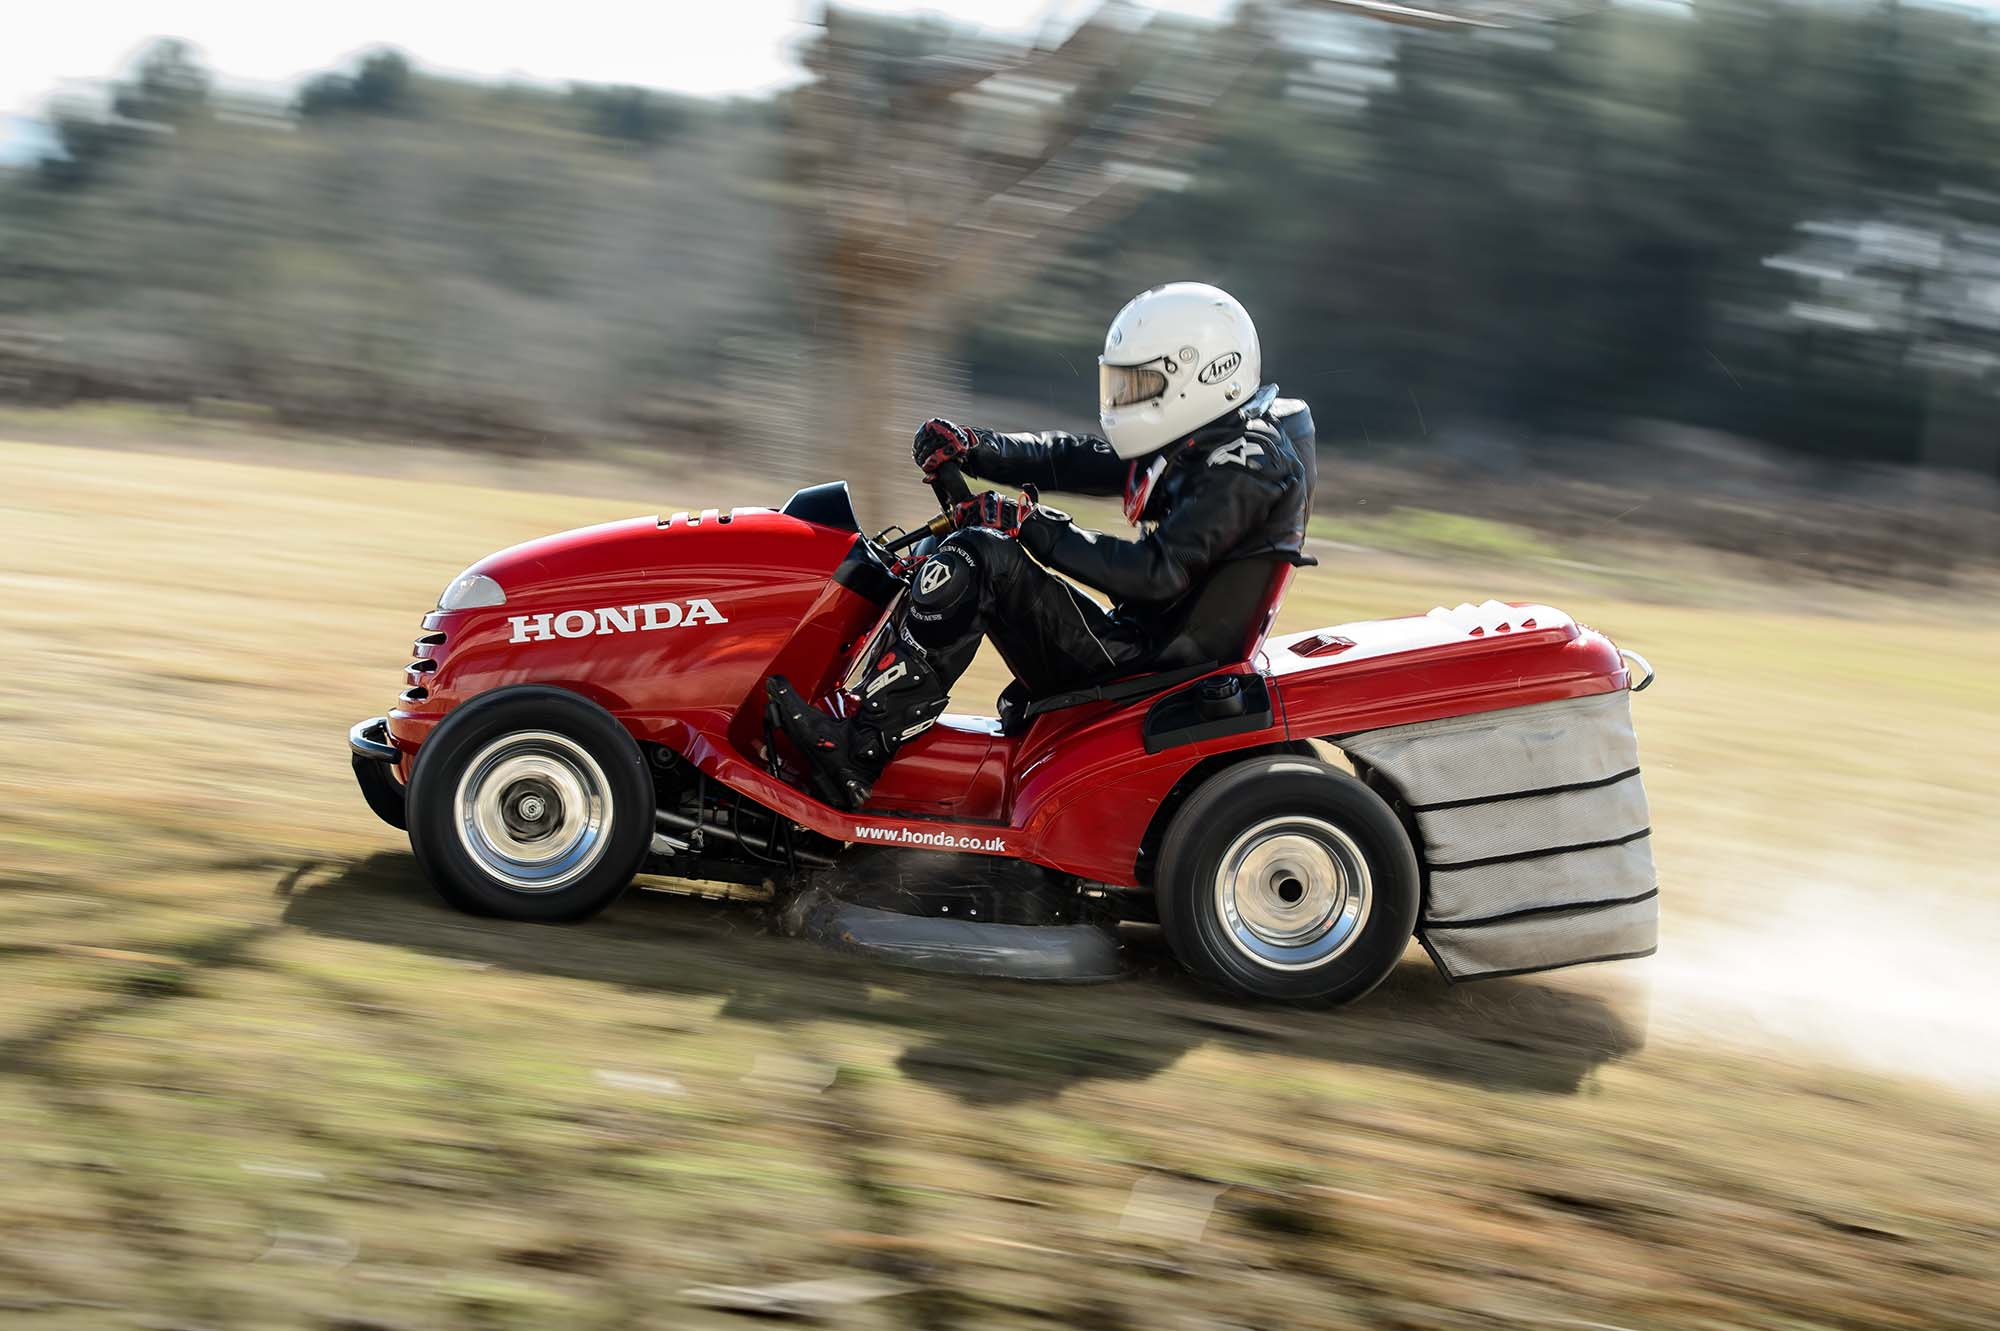 Lawn Mower Racing >> Honda Breaks World Record for Fastest Lawn Mower - Asphalt & Rubber